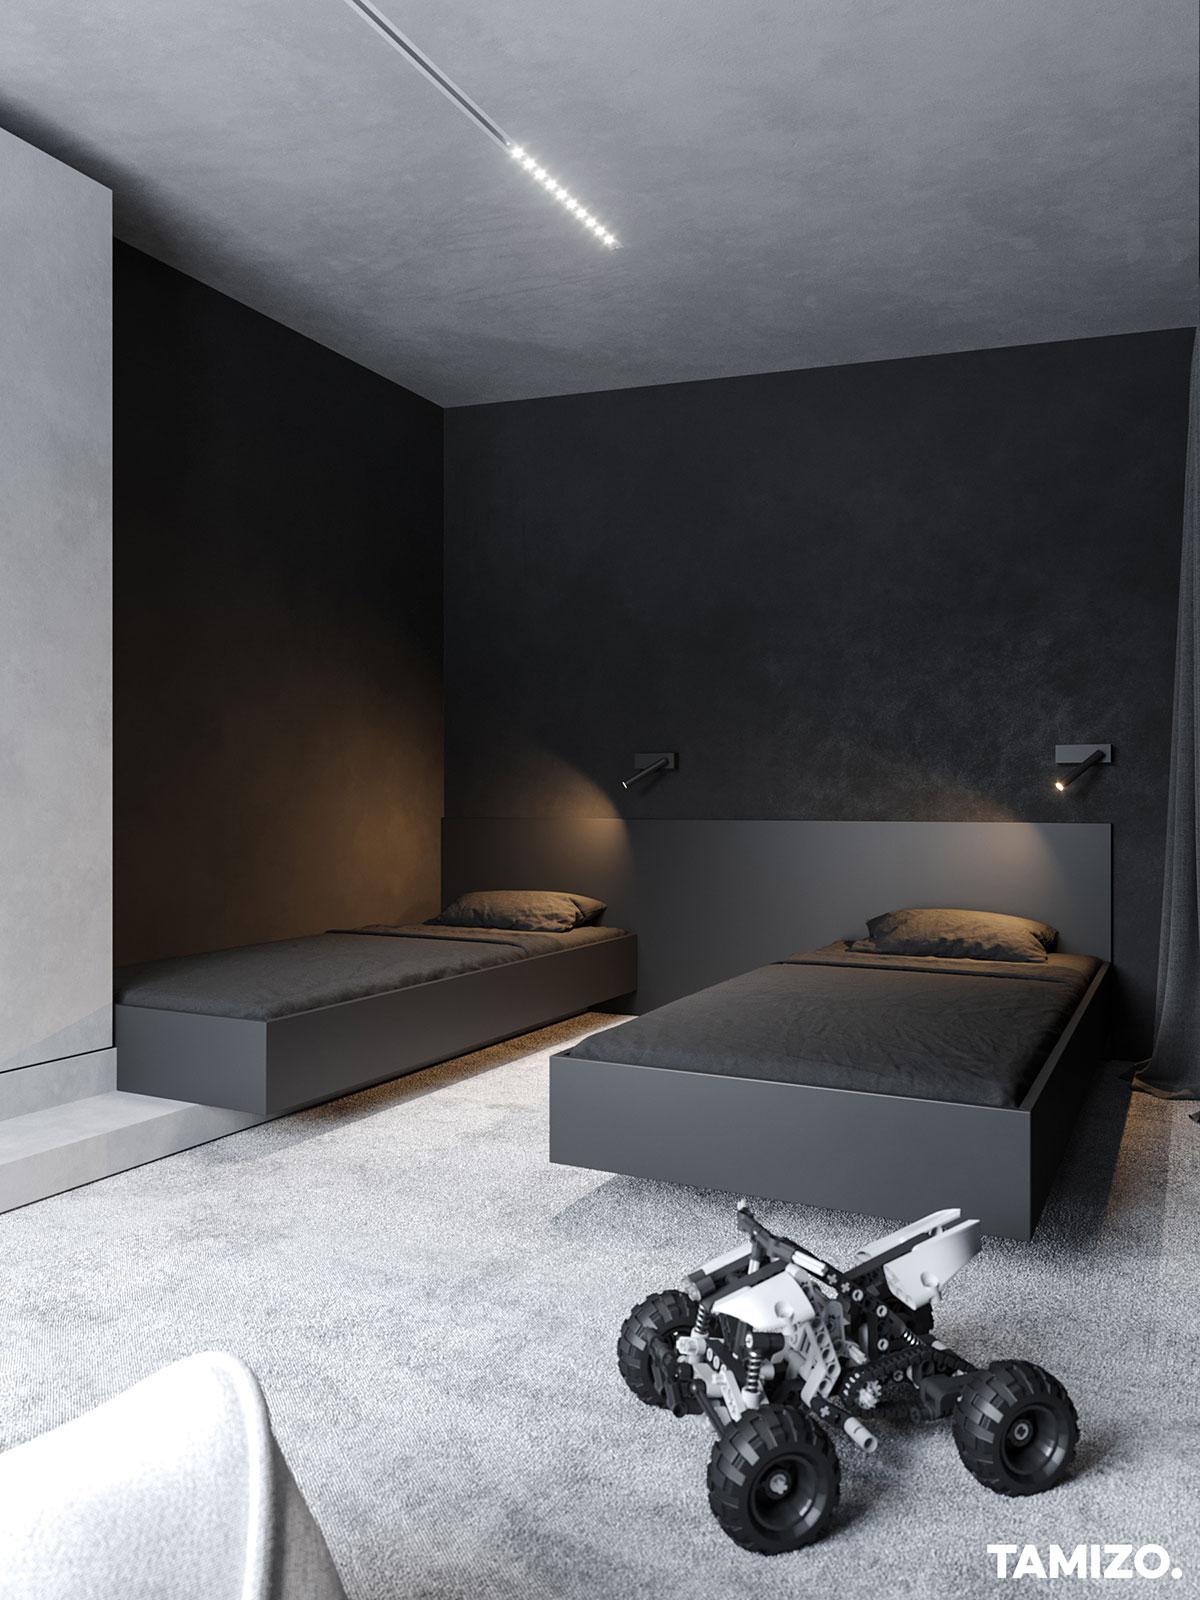 tamizo_architects_mateusz_kuo_stolarski_nice_nicea_france_iterior_design_apartment_22